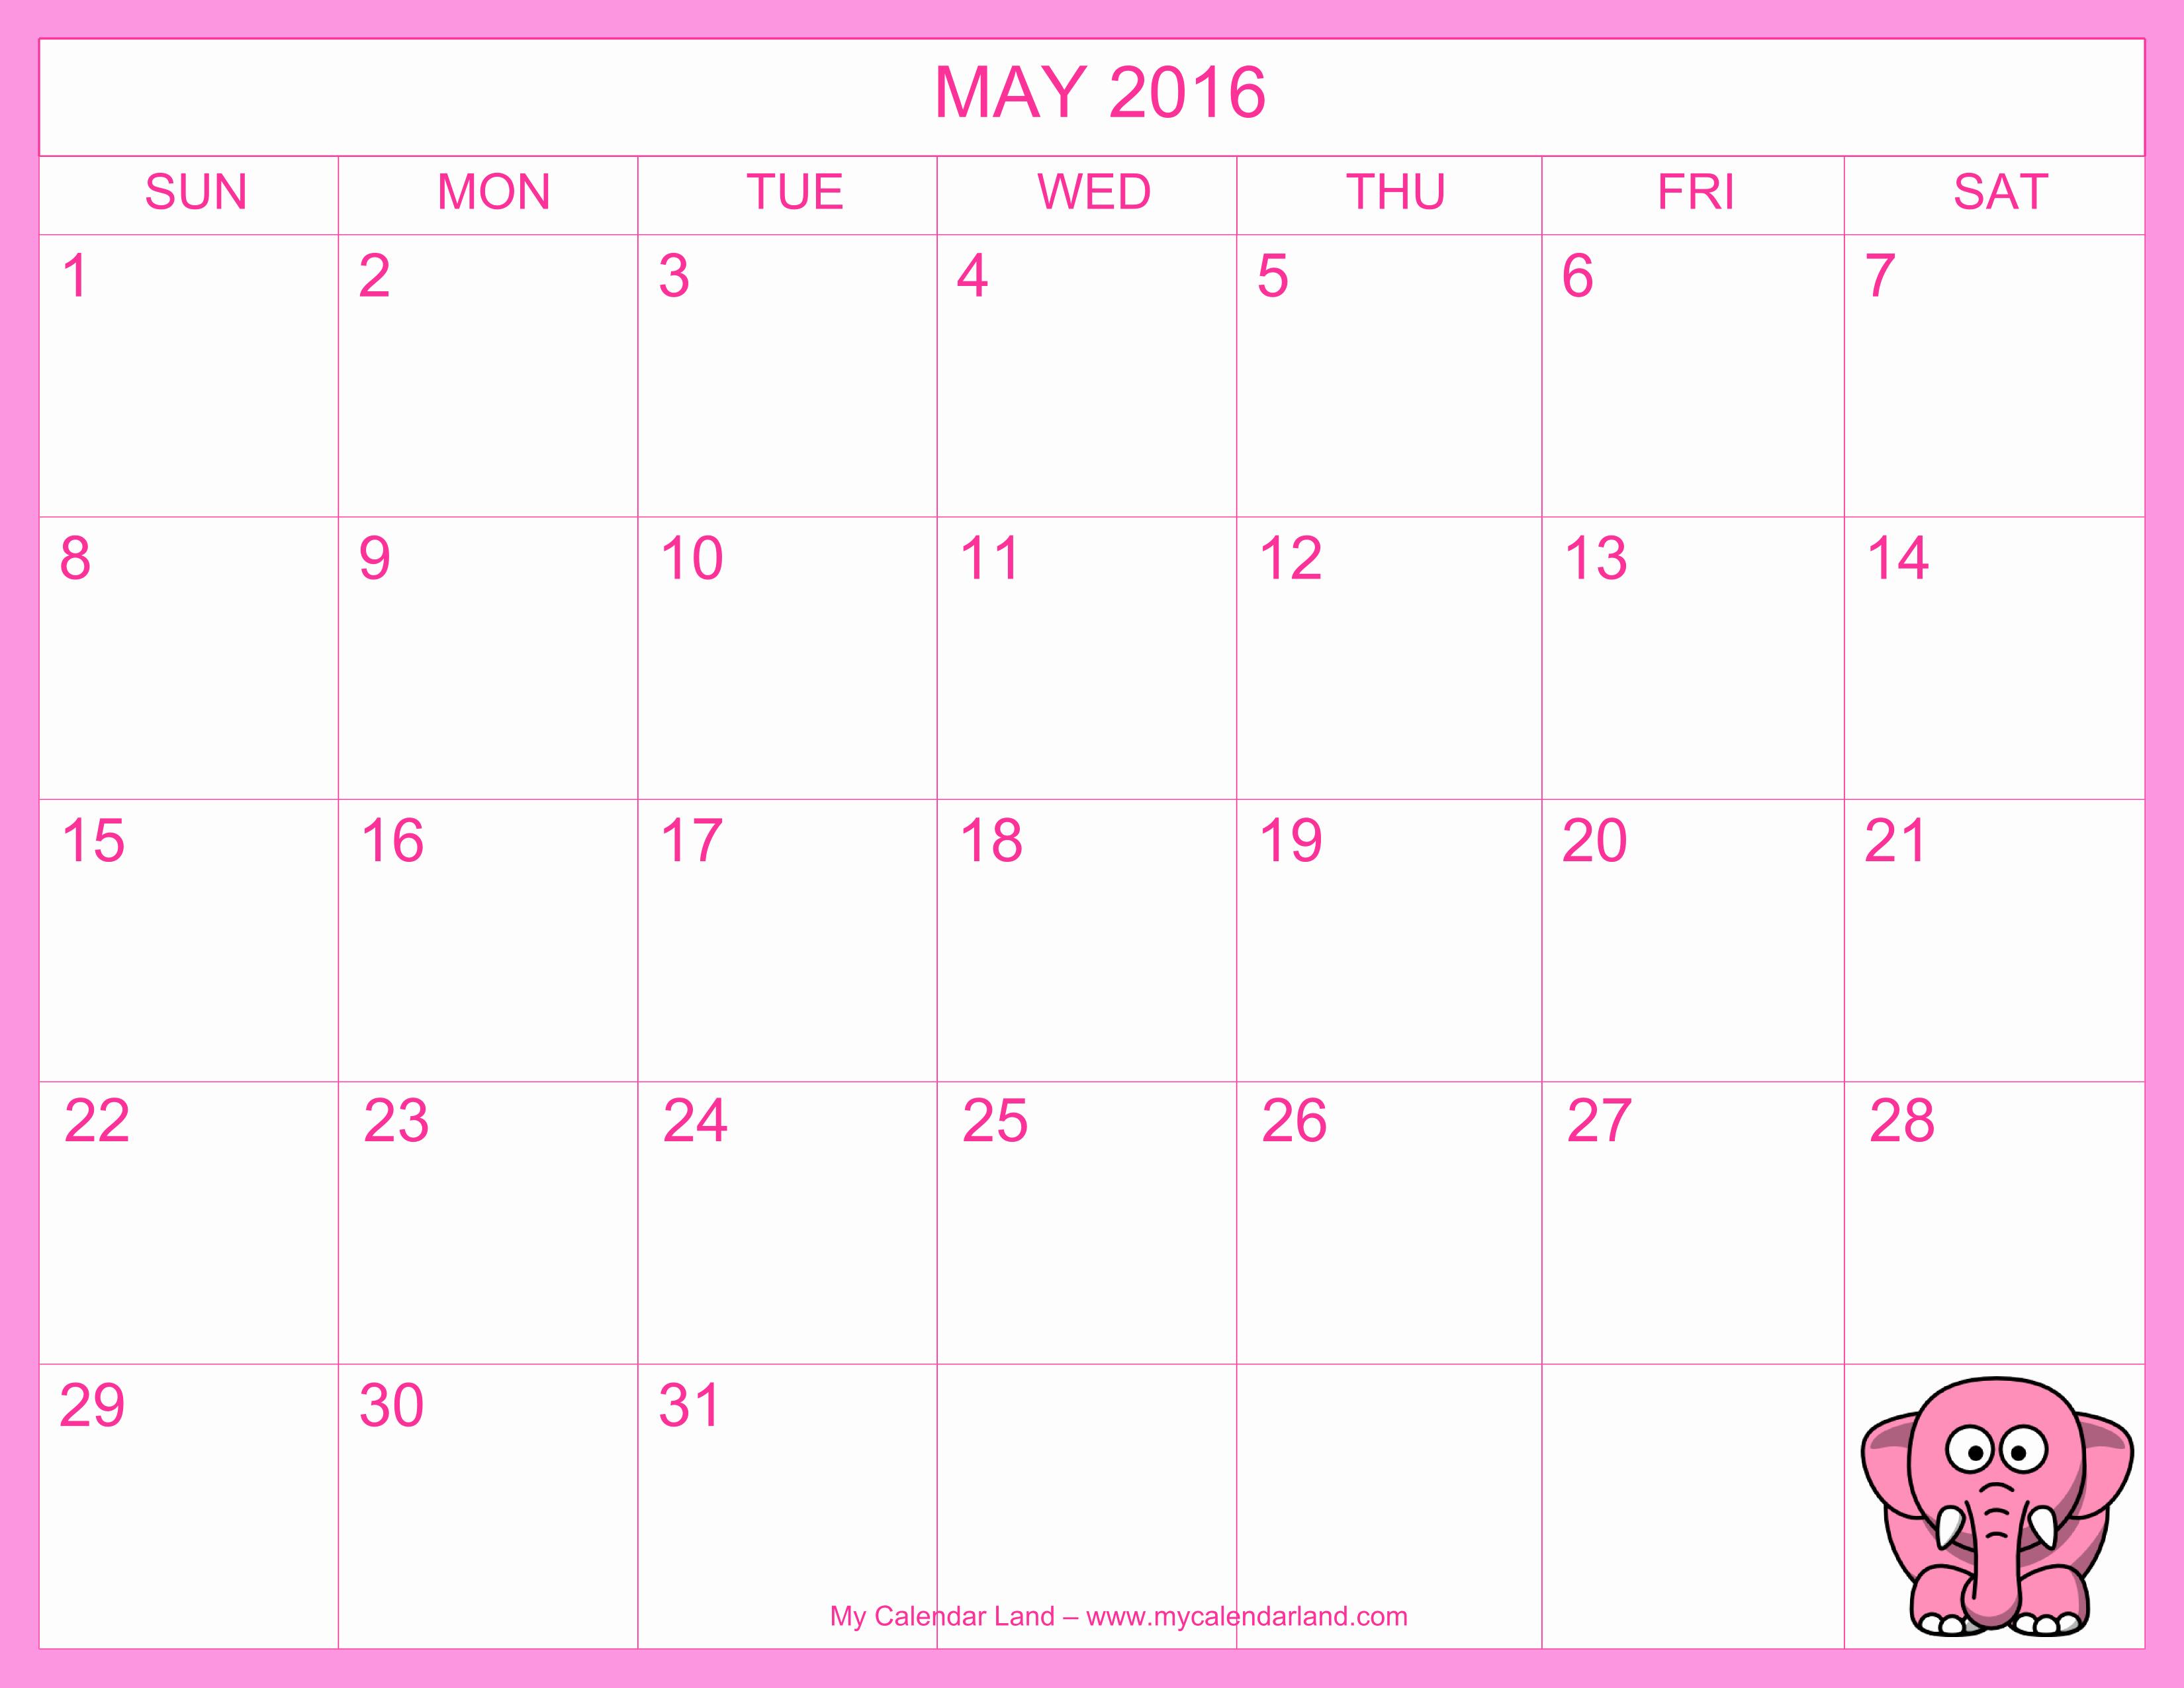 Calendar 2016 Printable with Holidays Awesome Printable Monthly 2016 Calendar with Holidays